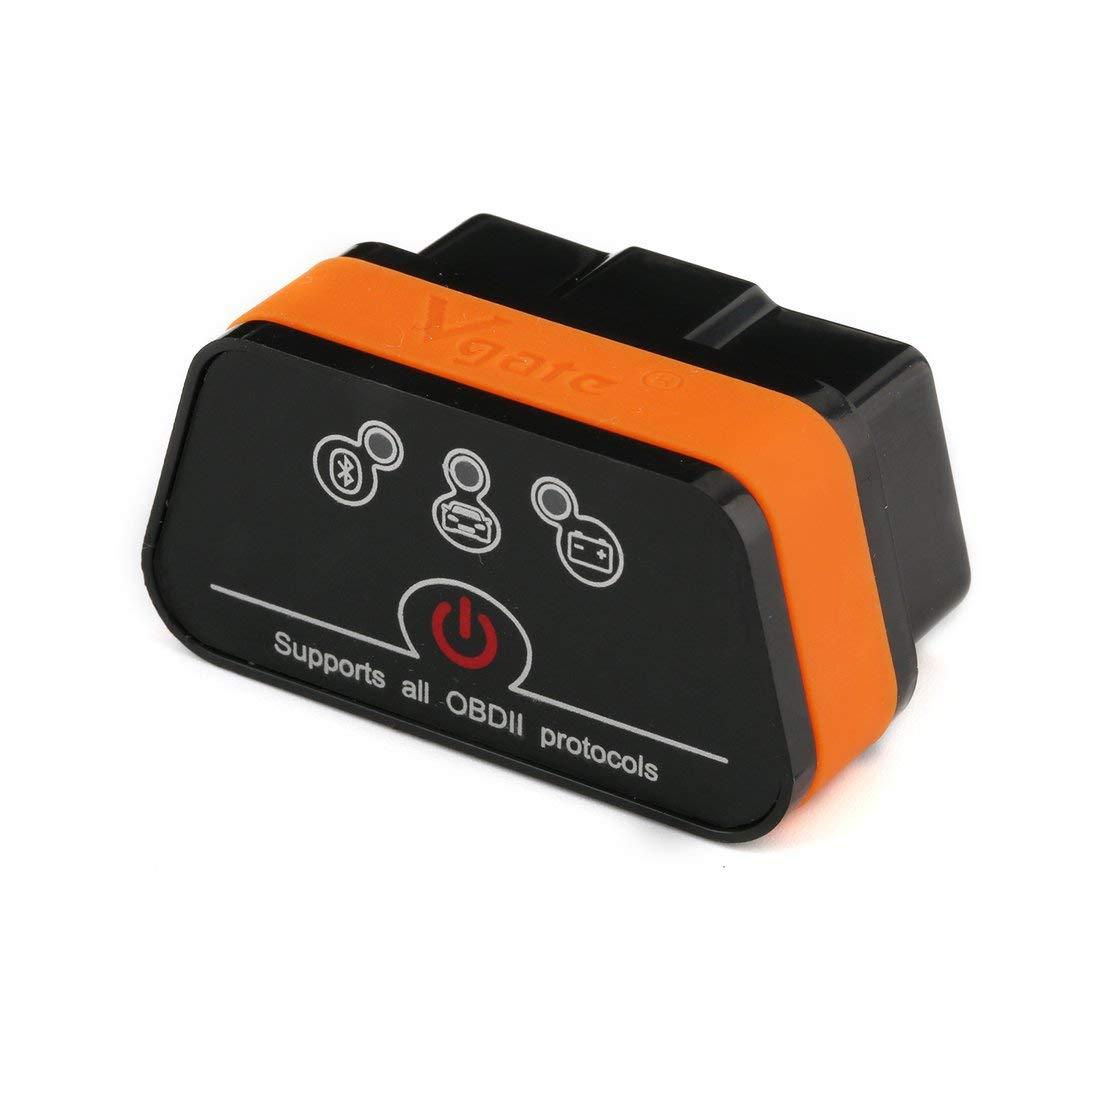 Bluetooth Vgate iCar2 Bluetooth Auto OBDII Adapter Vgate iCar 2 Bluetooth Mini mit 6 Farben Hermosairis